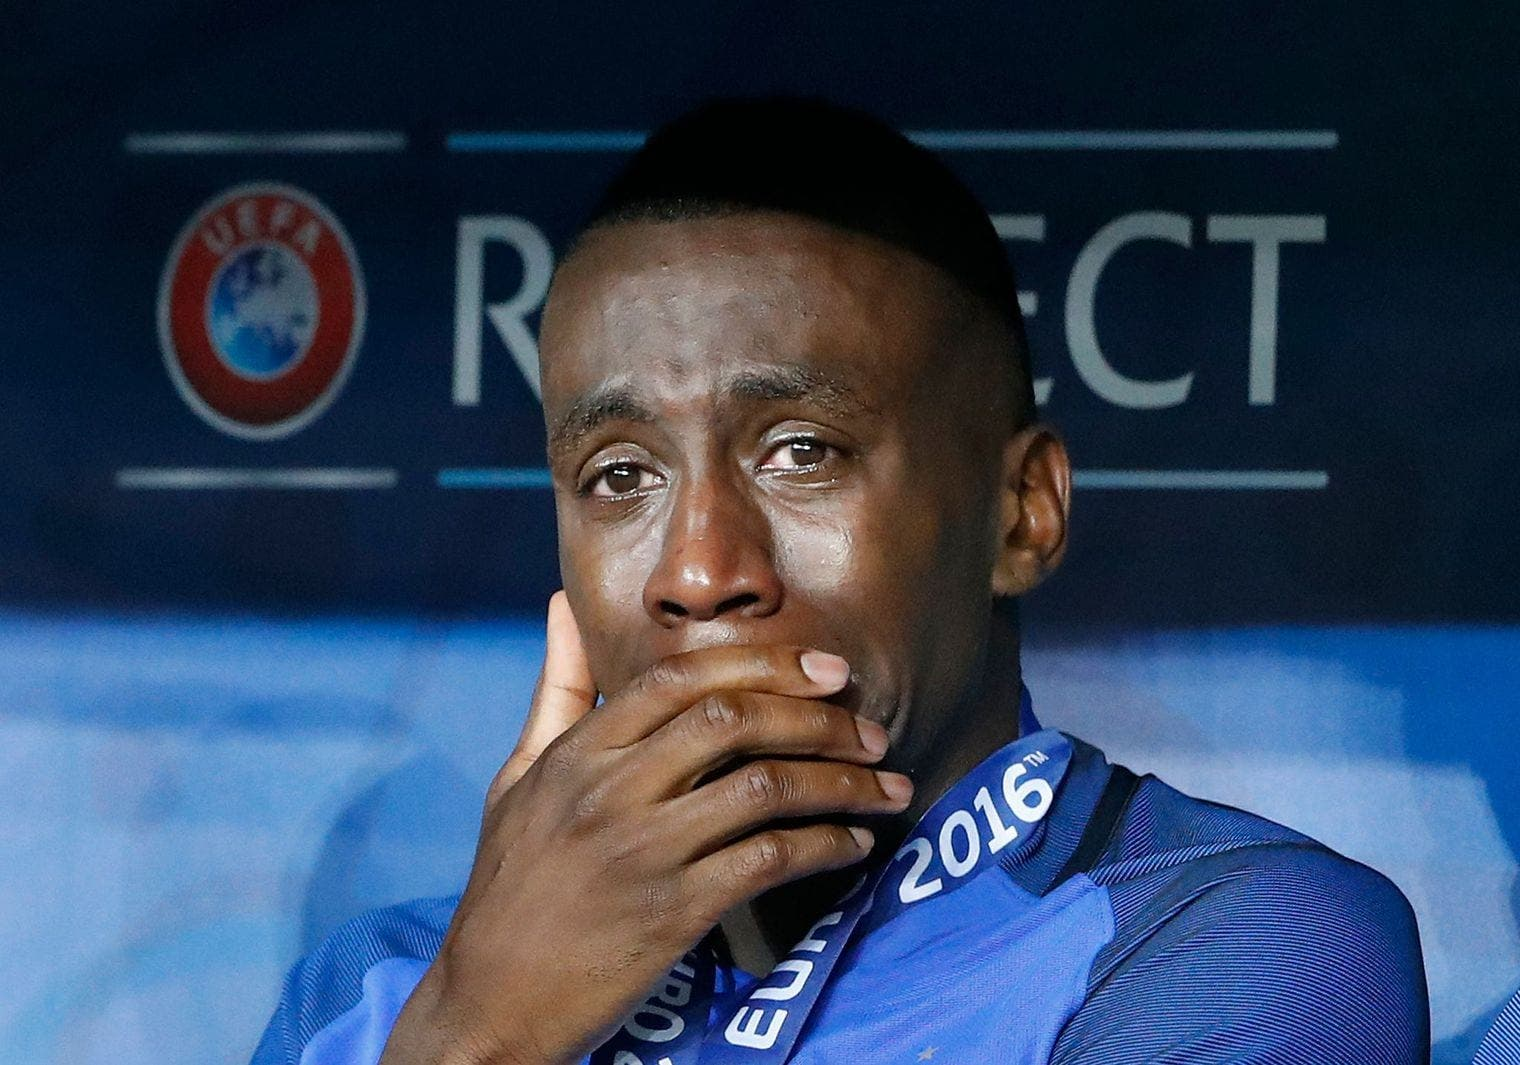 Juventus : Le milieu français Blaise Matuidi testé positif au coronavirus !